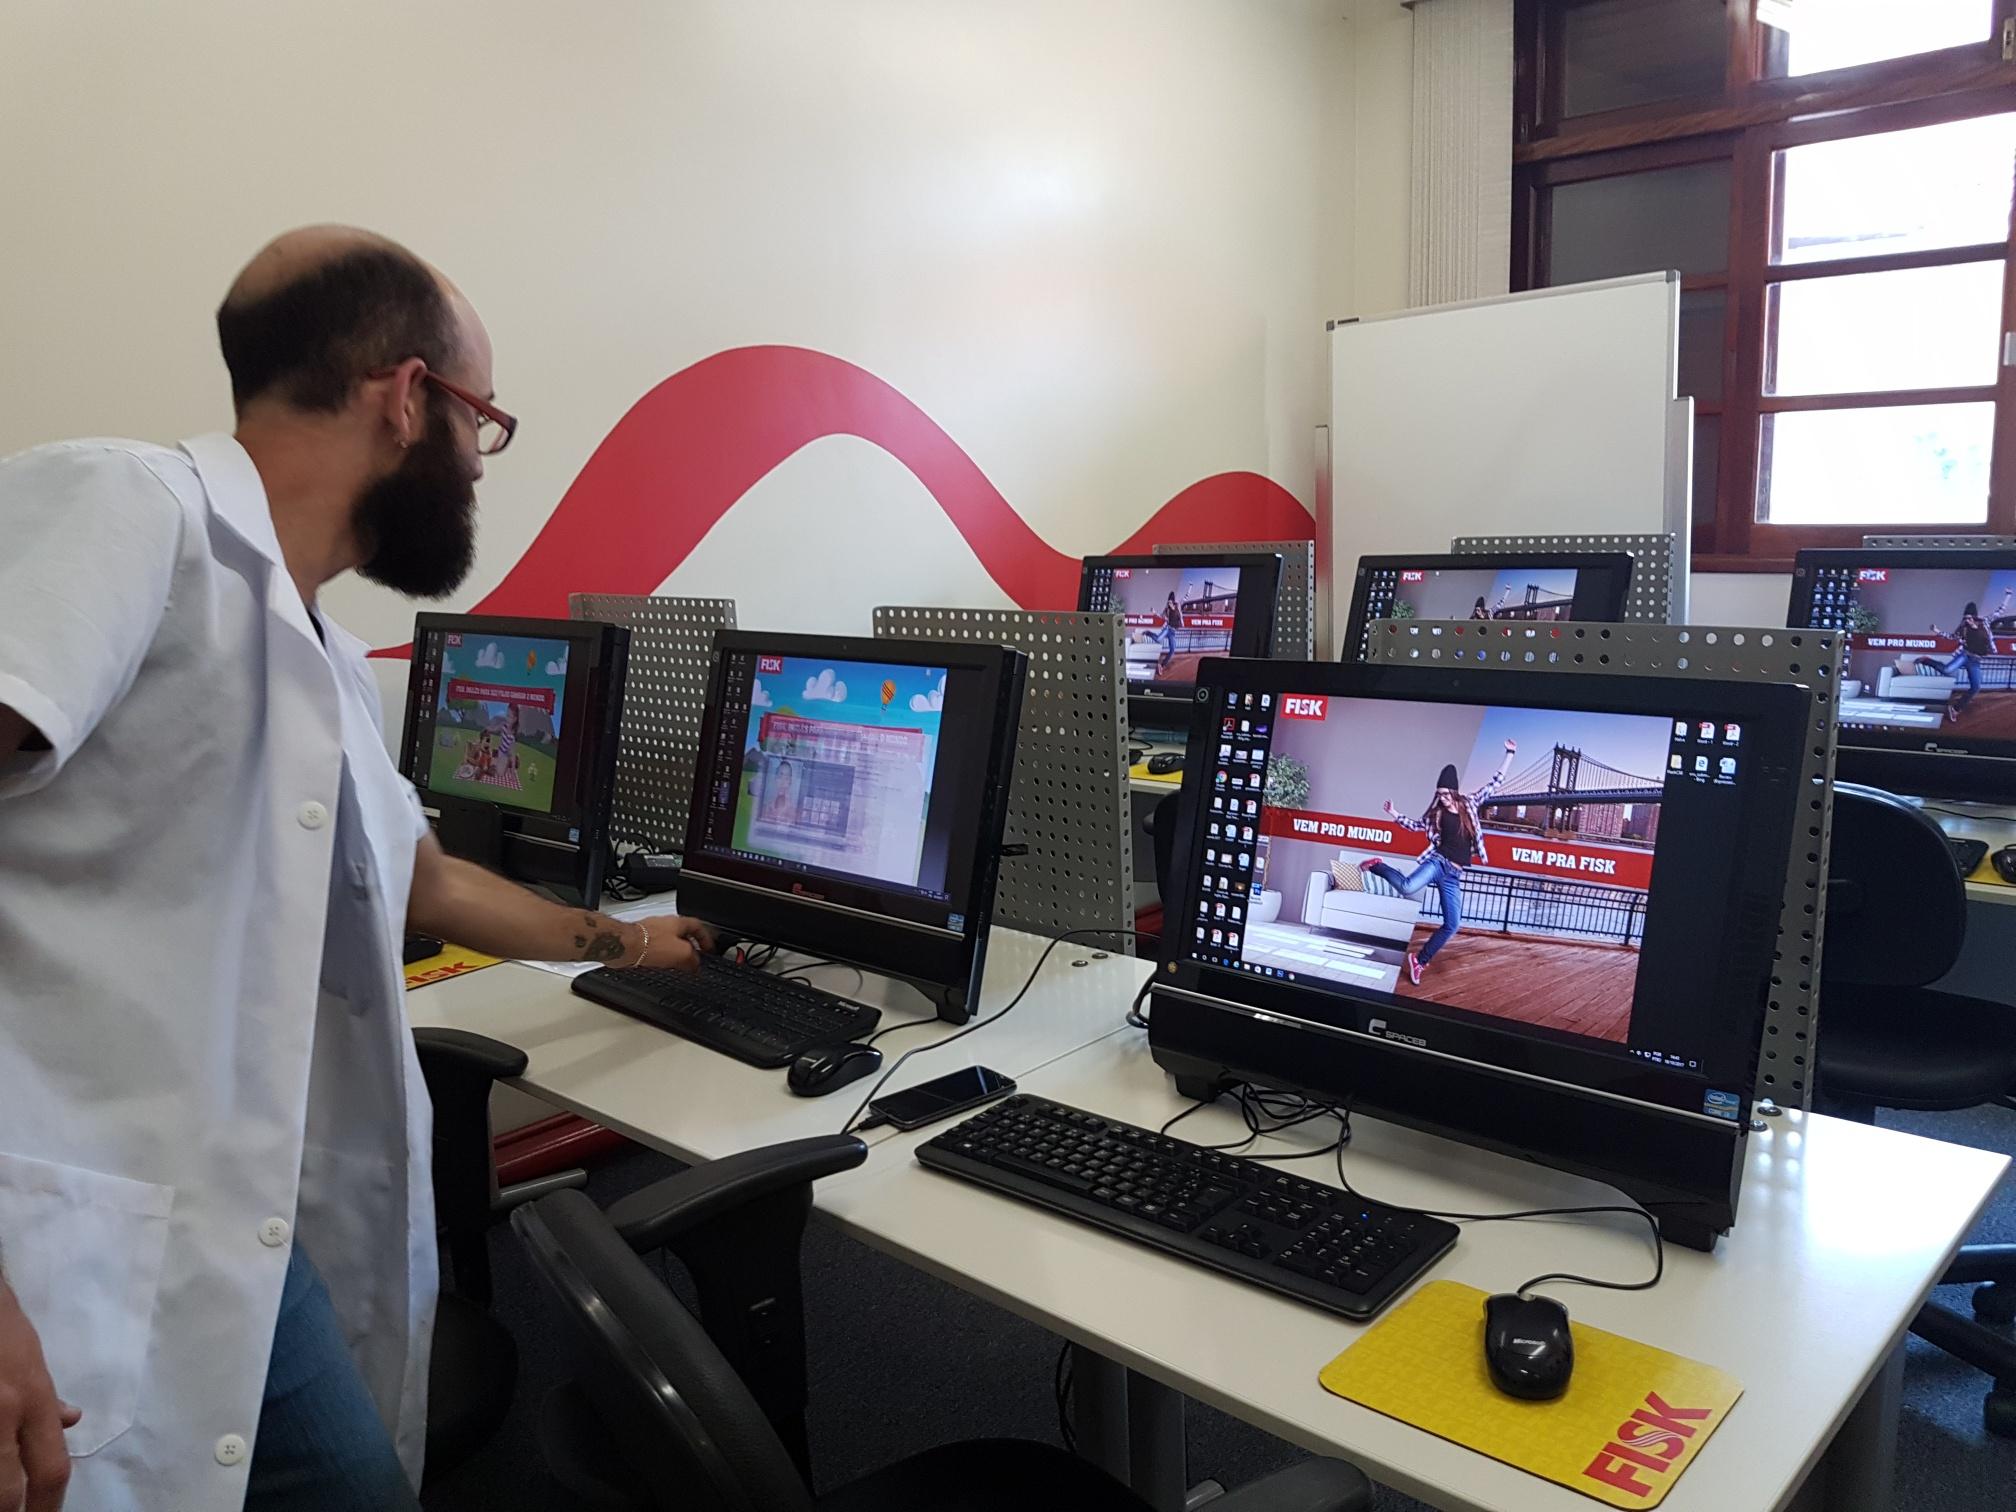 Fisk Sobral/CE – Visita à escola de Santo André/SP